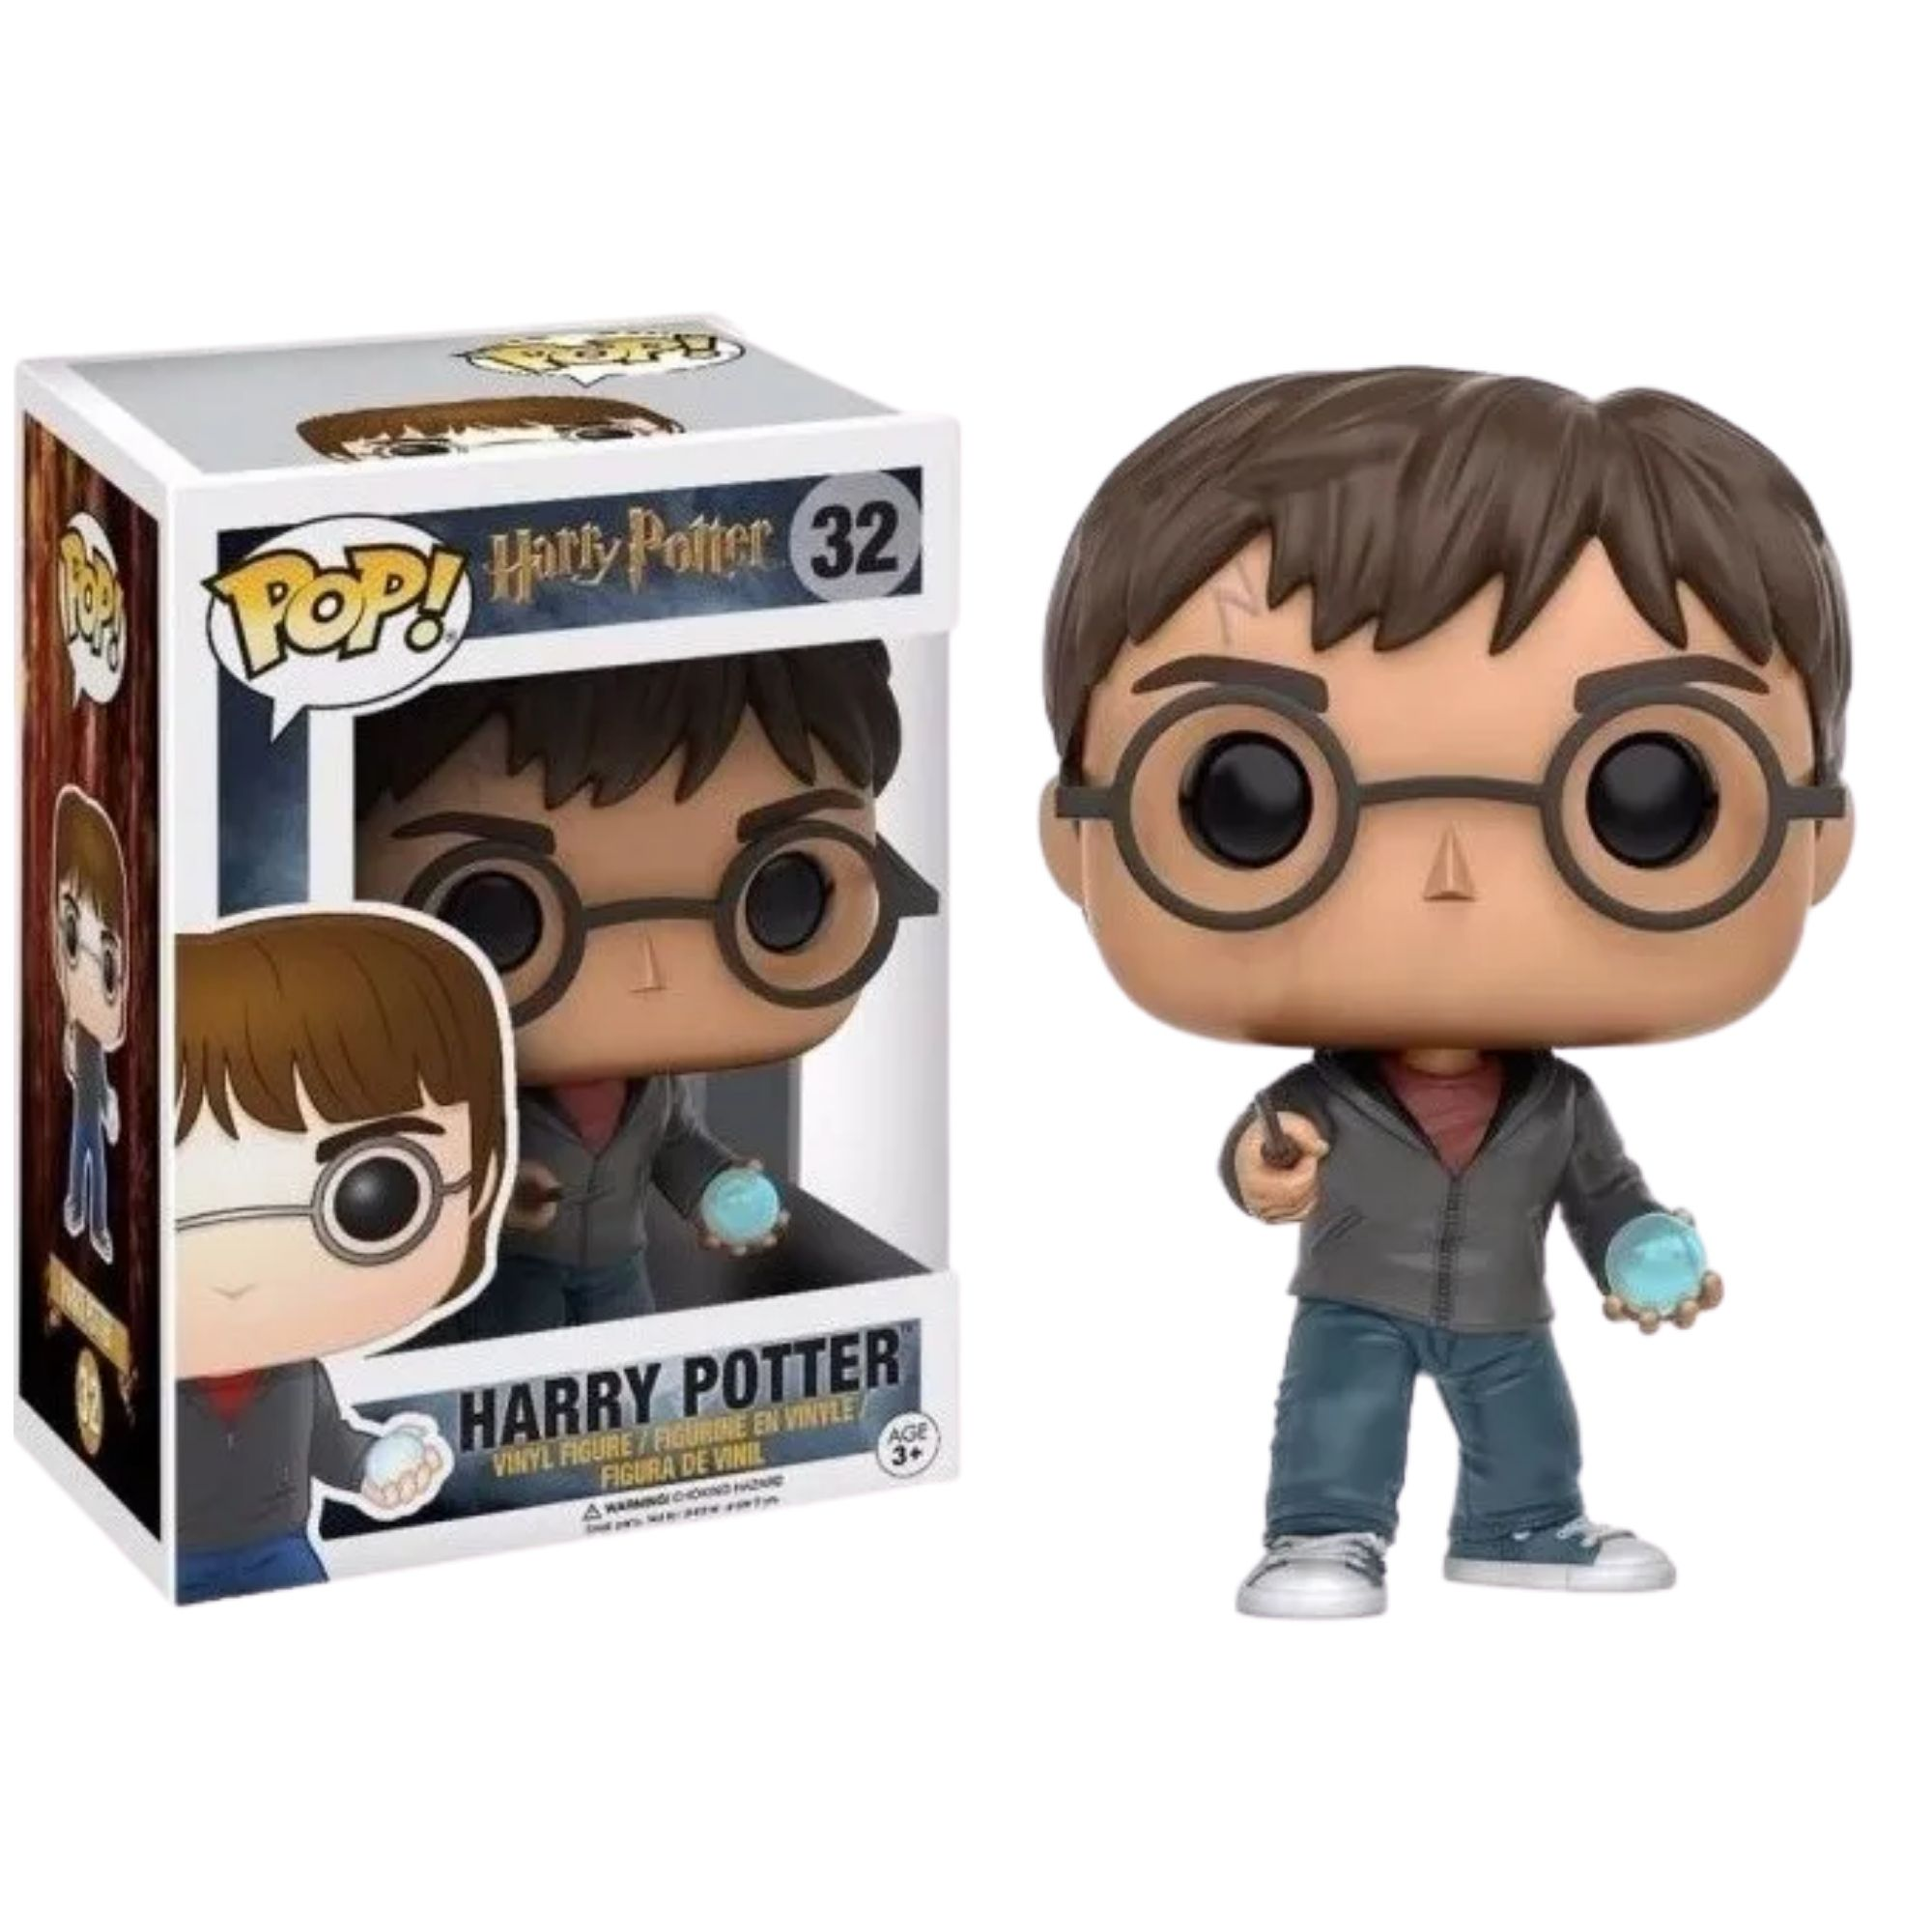 Boneco Funko Pop Harry Potter Profecia 32  - Game Land Brinquedos